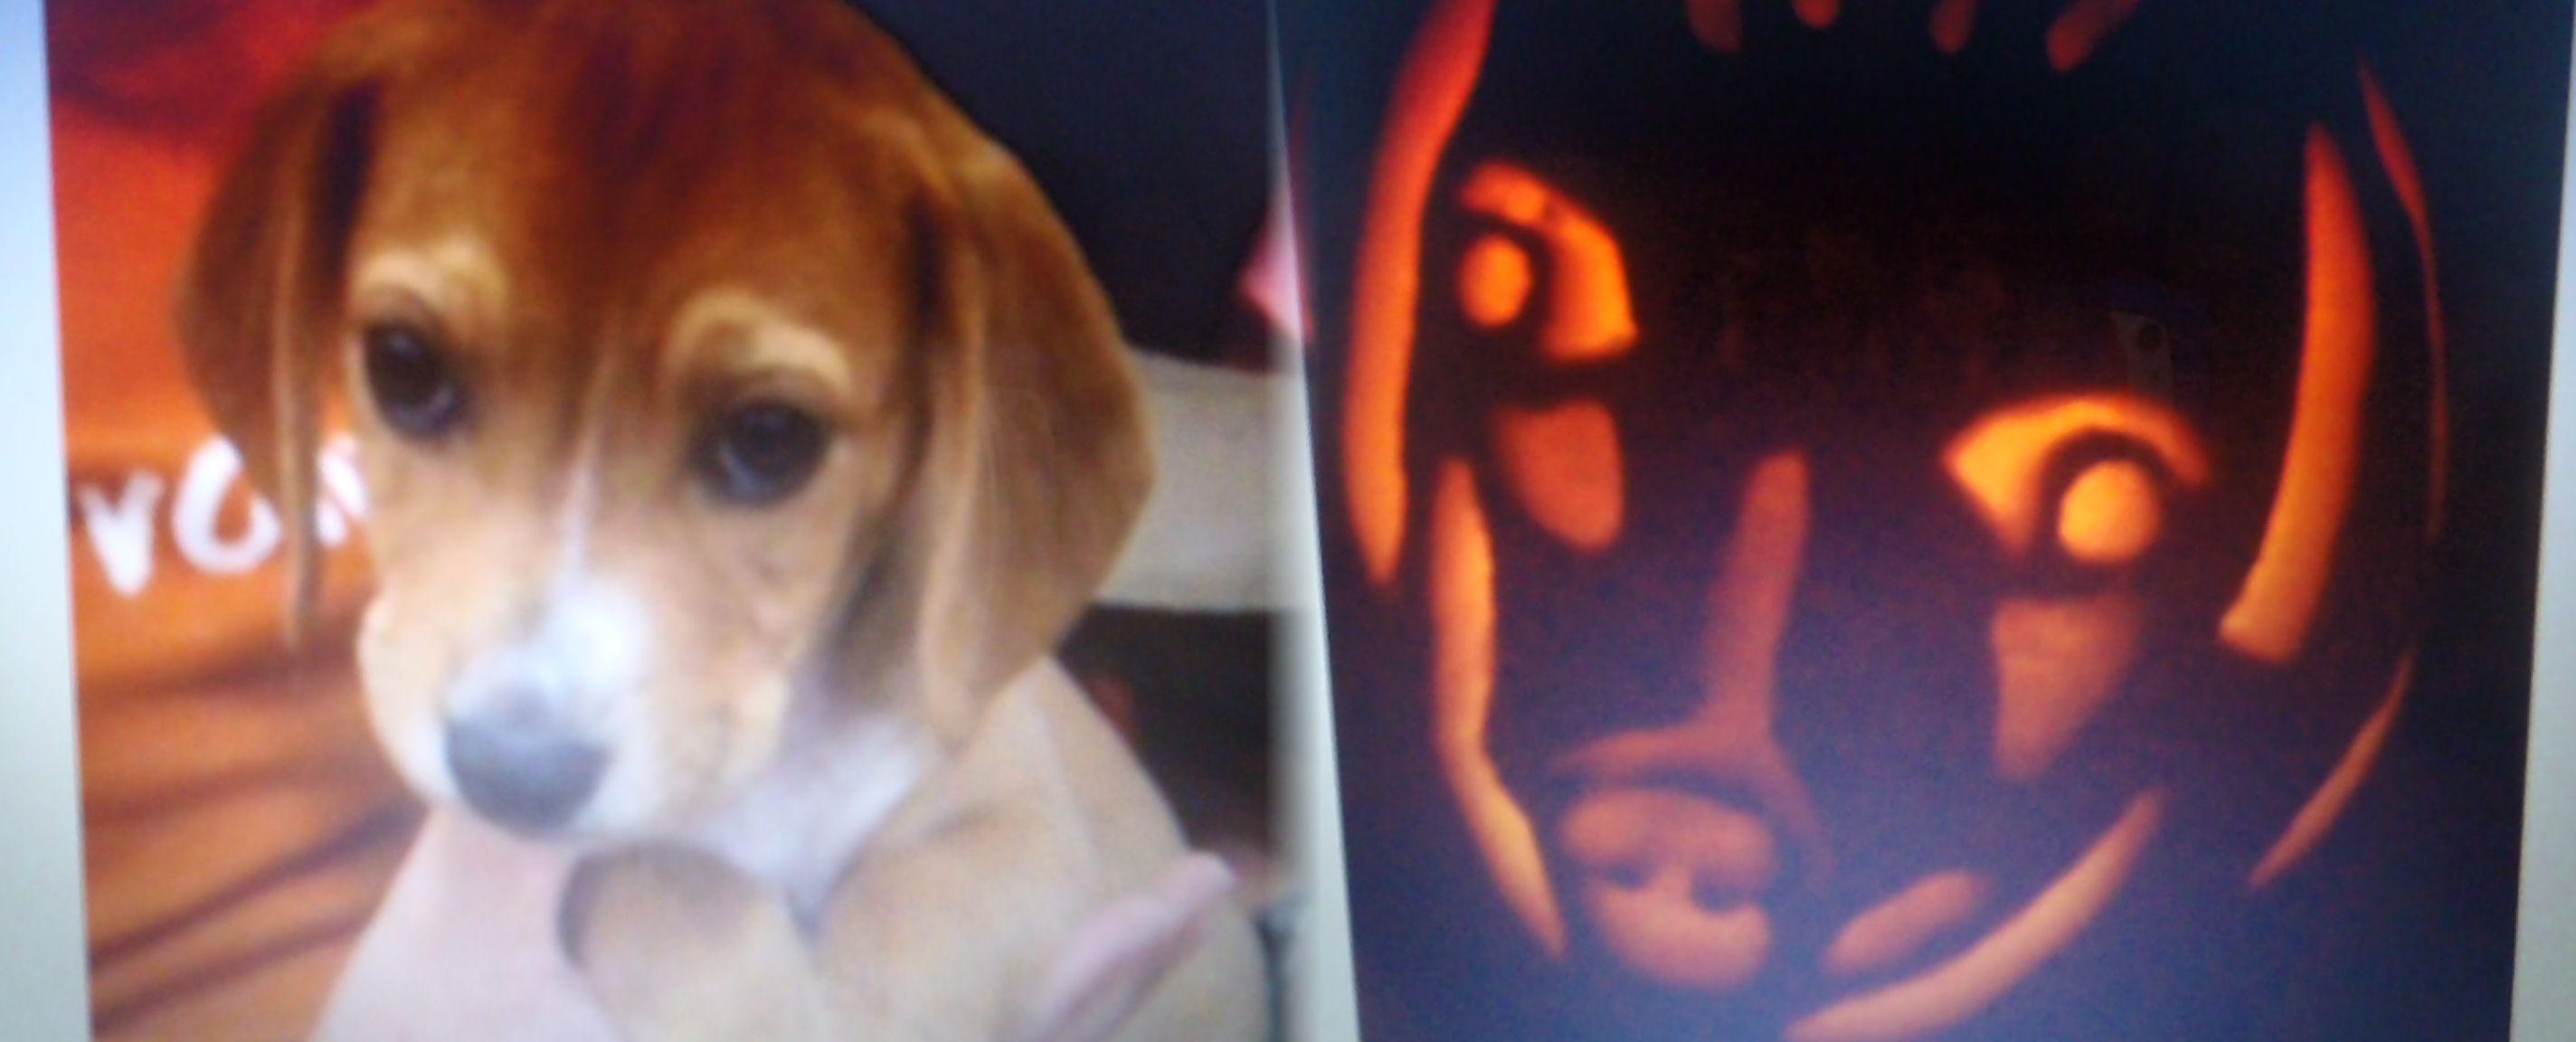 Pumpkin carving - puppy.